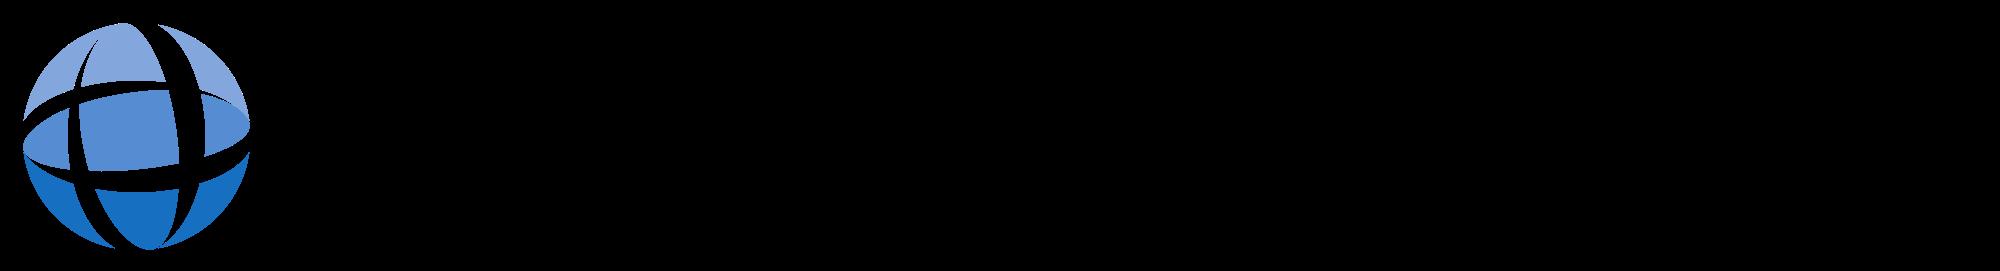 Logo netzpolitik.org (CC BY-NC-SA 3.0)